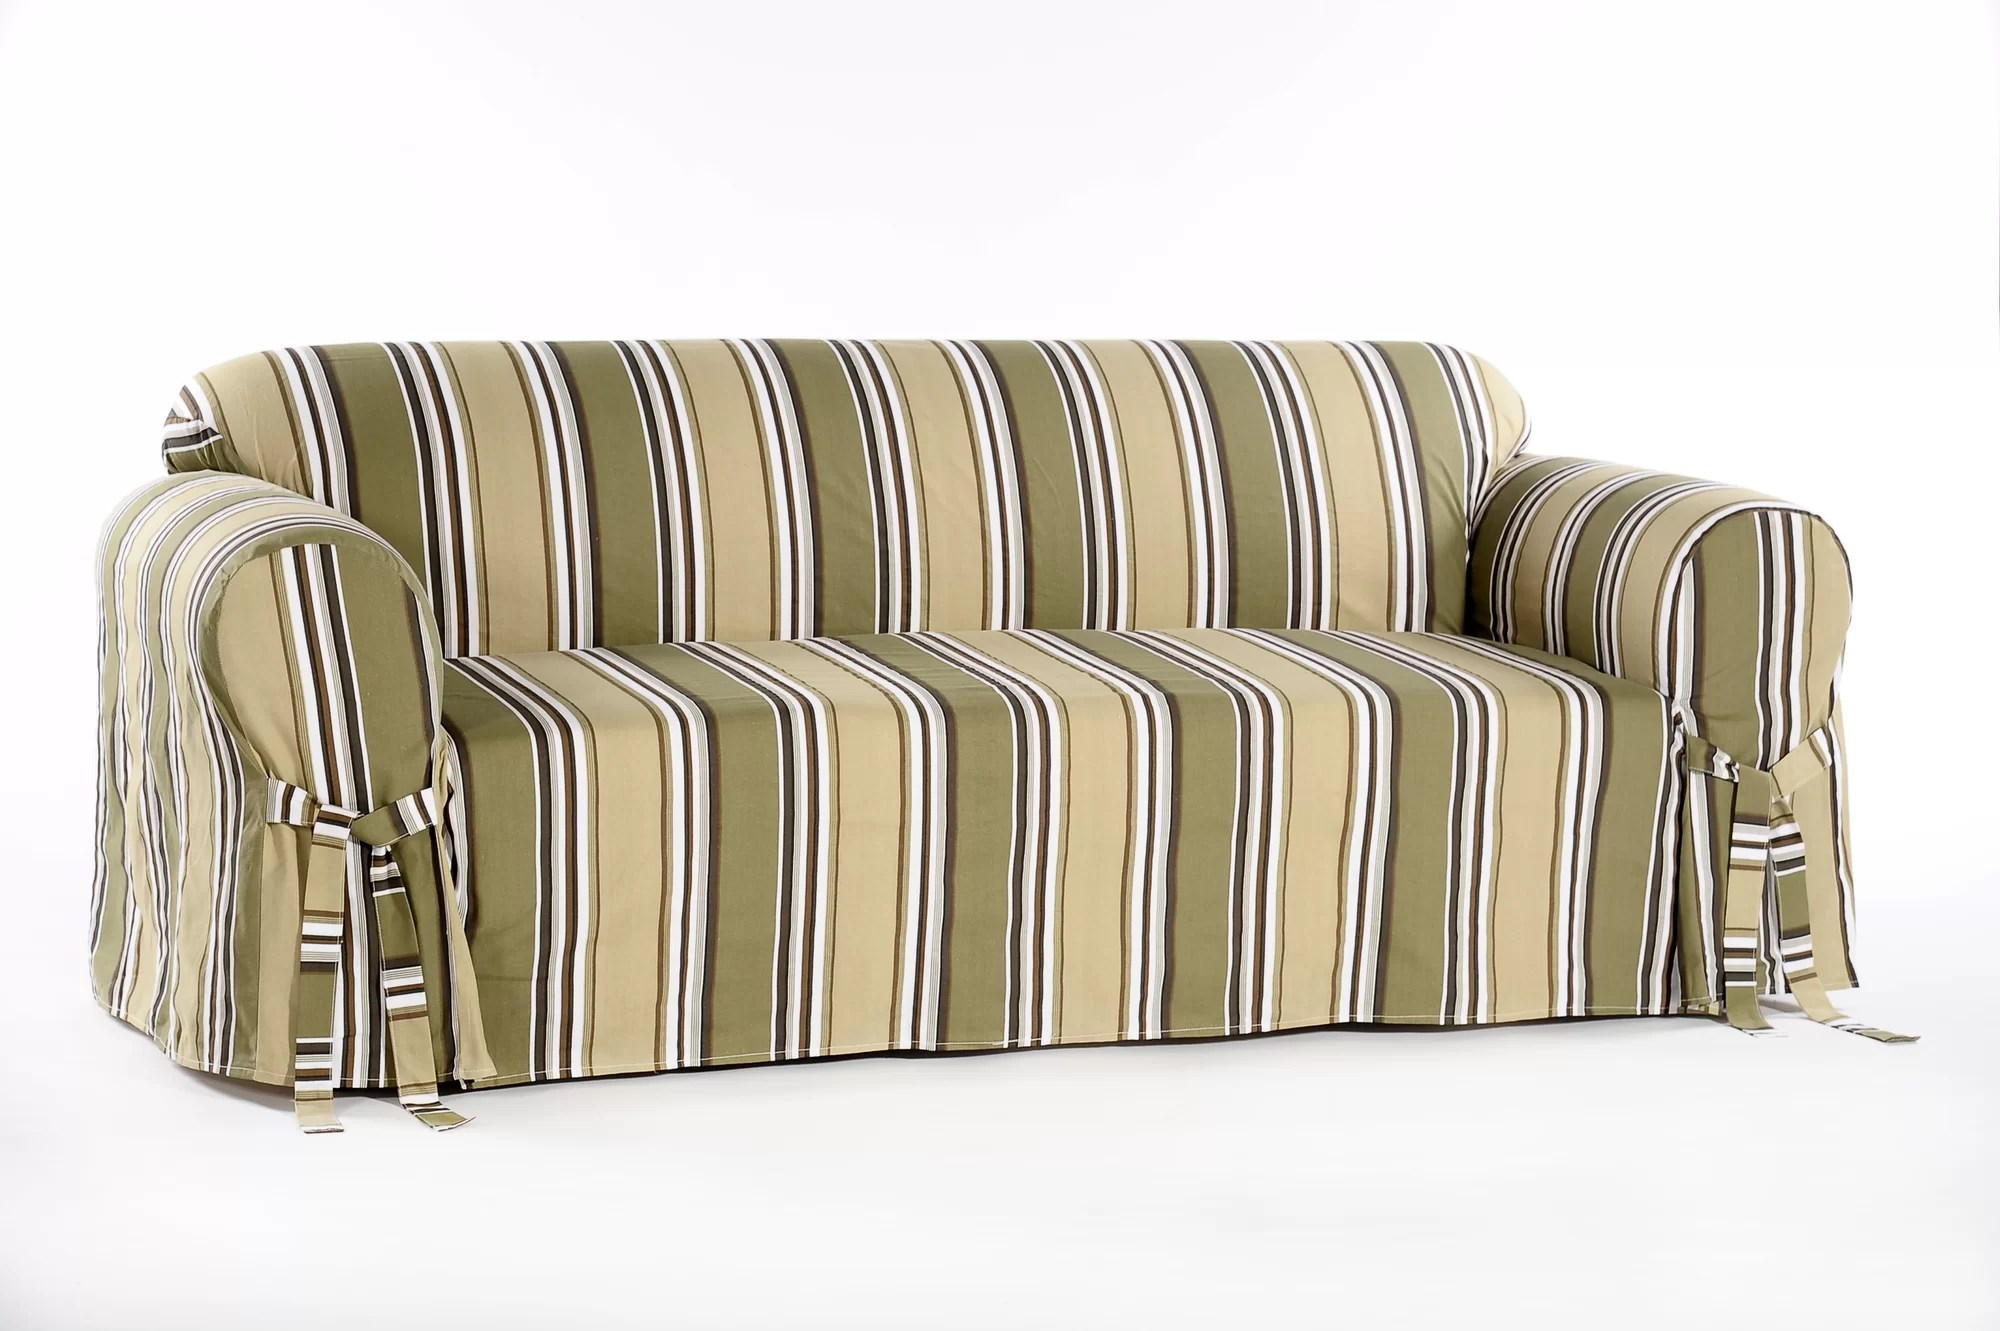 william sonoma chair covers revolving chairs online pakistan classic slipcovers stripe duck sofa slipcover ebay